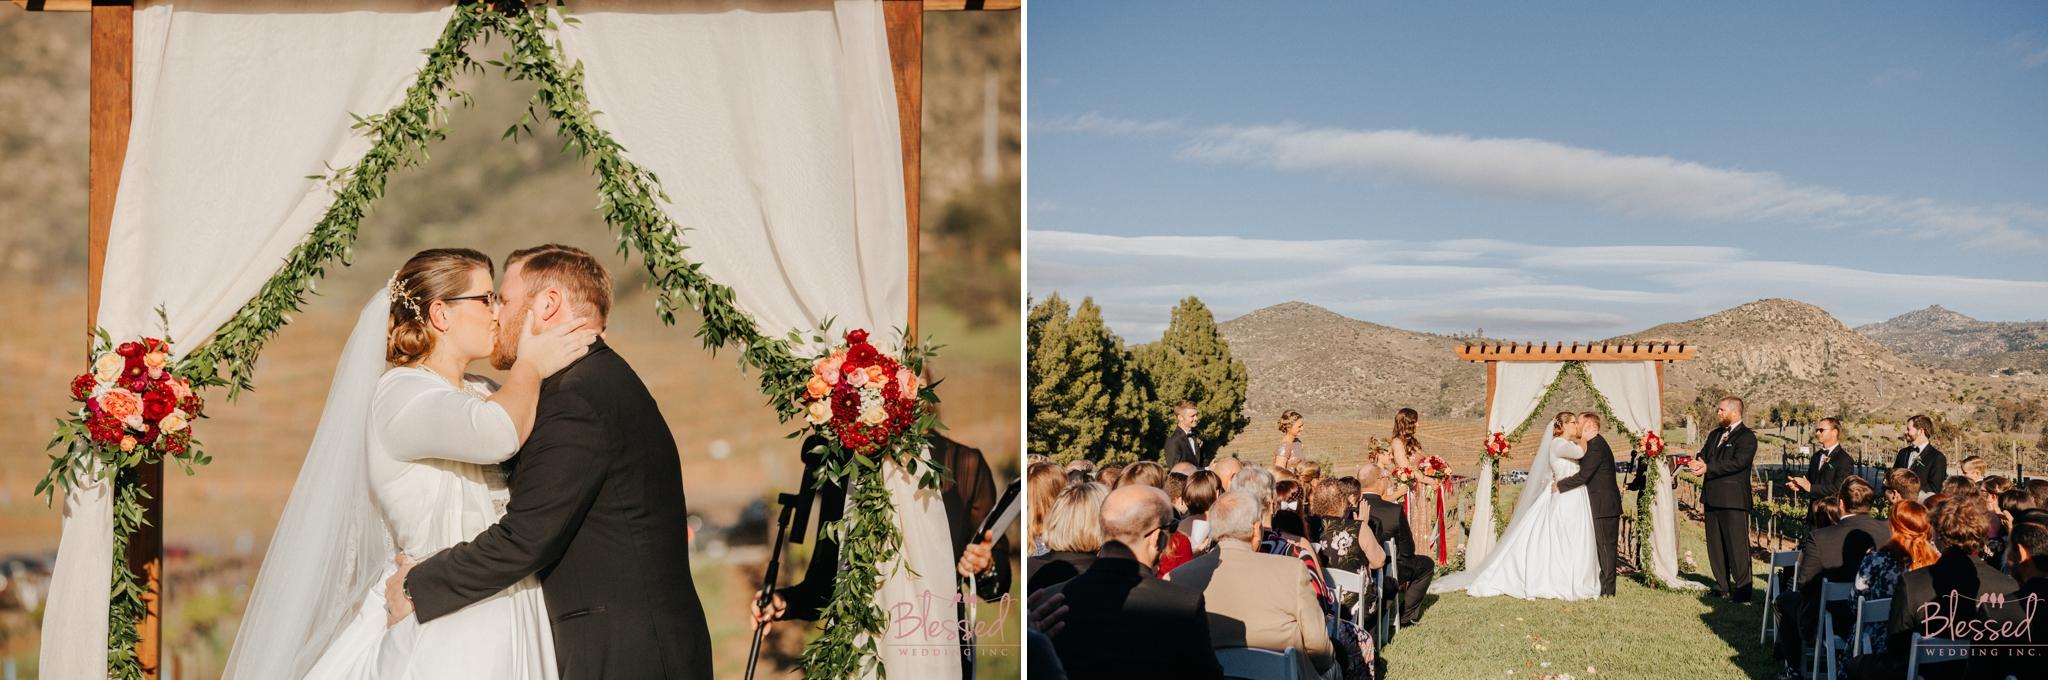 Orfila Vinery Wedding Temecula Wedding Photographer 19.jpg